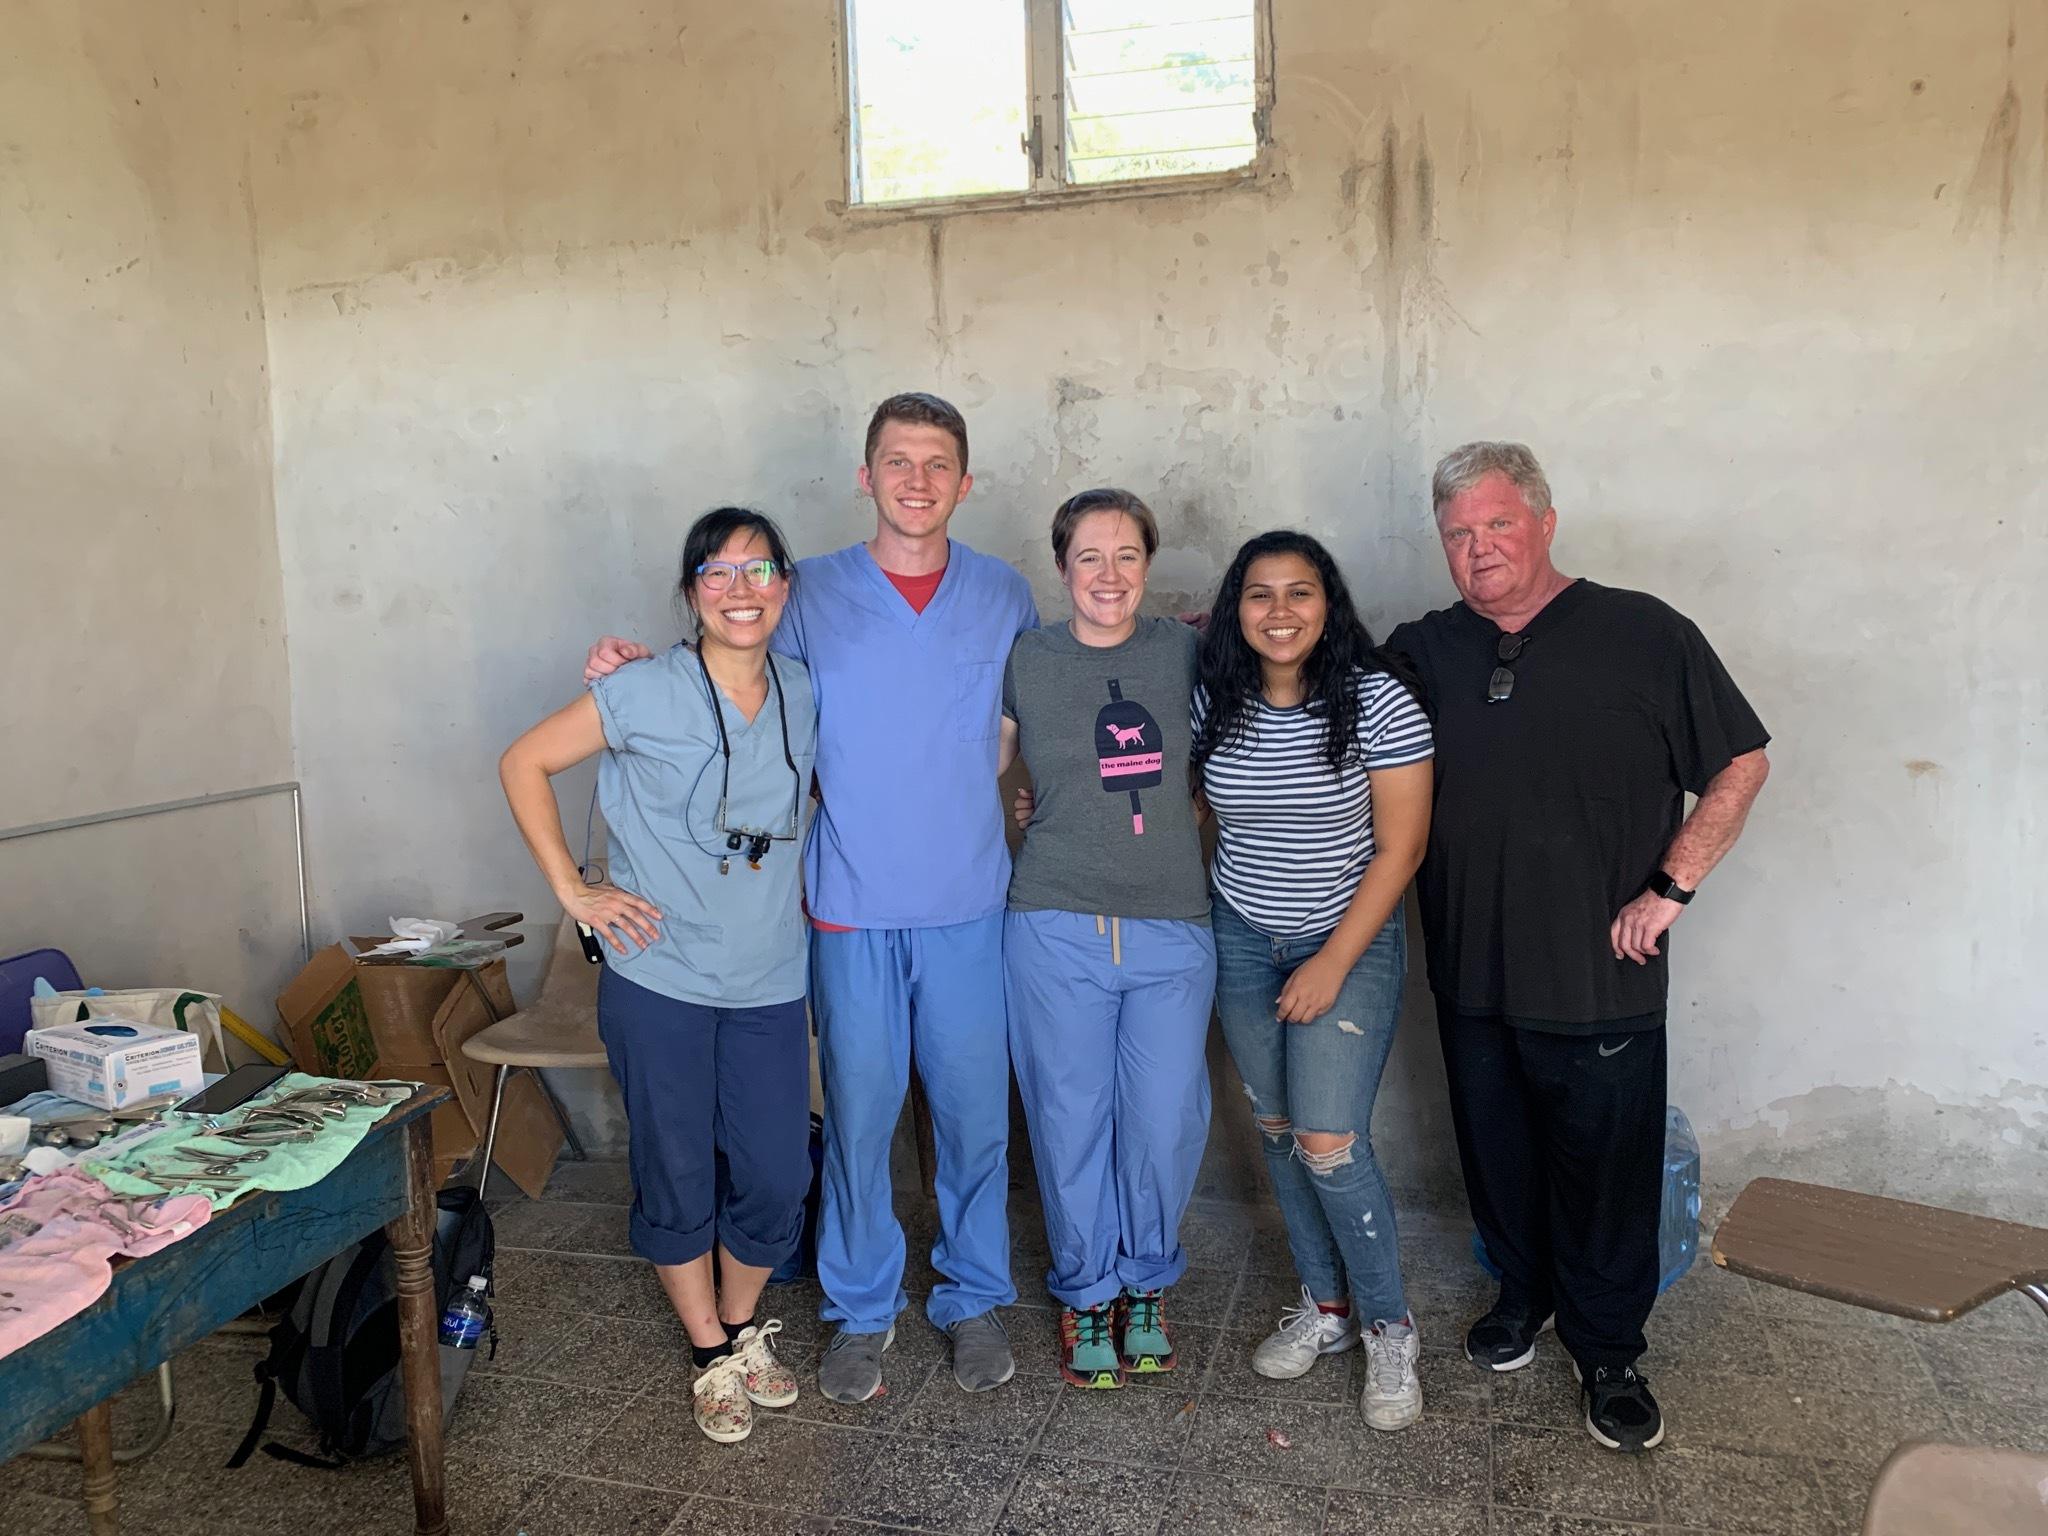 Rev. Vanessa Winters, of the Westhampton Presbyterian Church, with the dental team at the village of Juan Orlando.